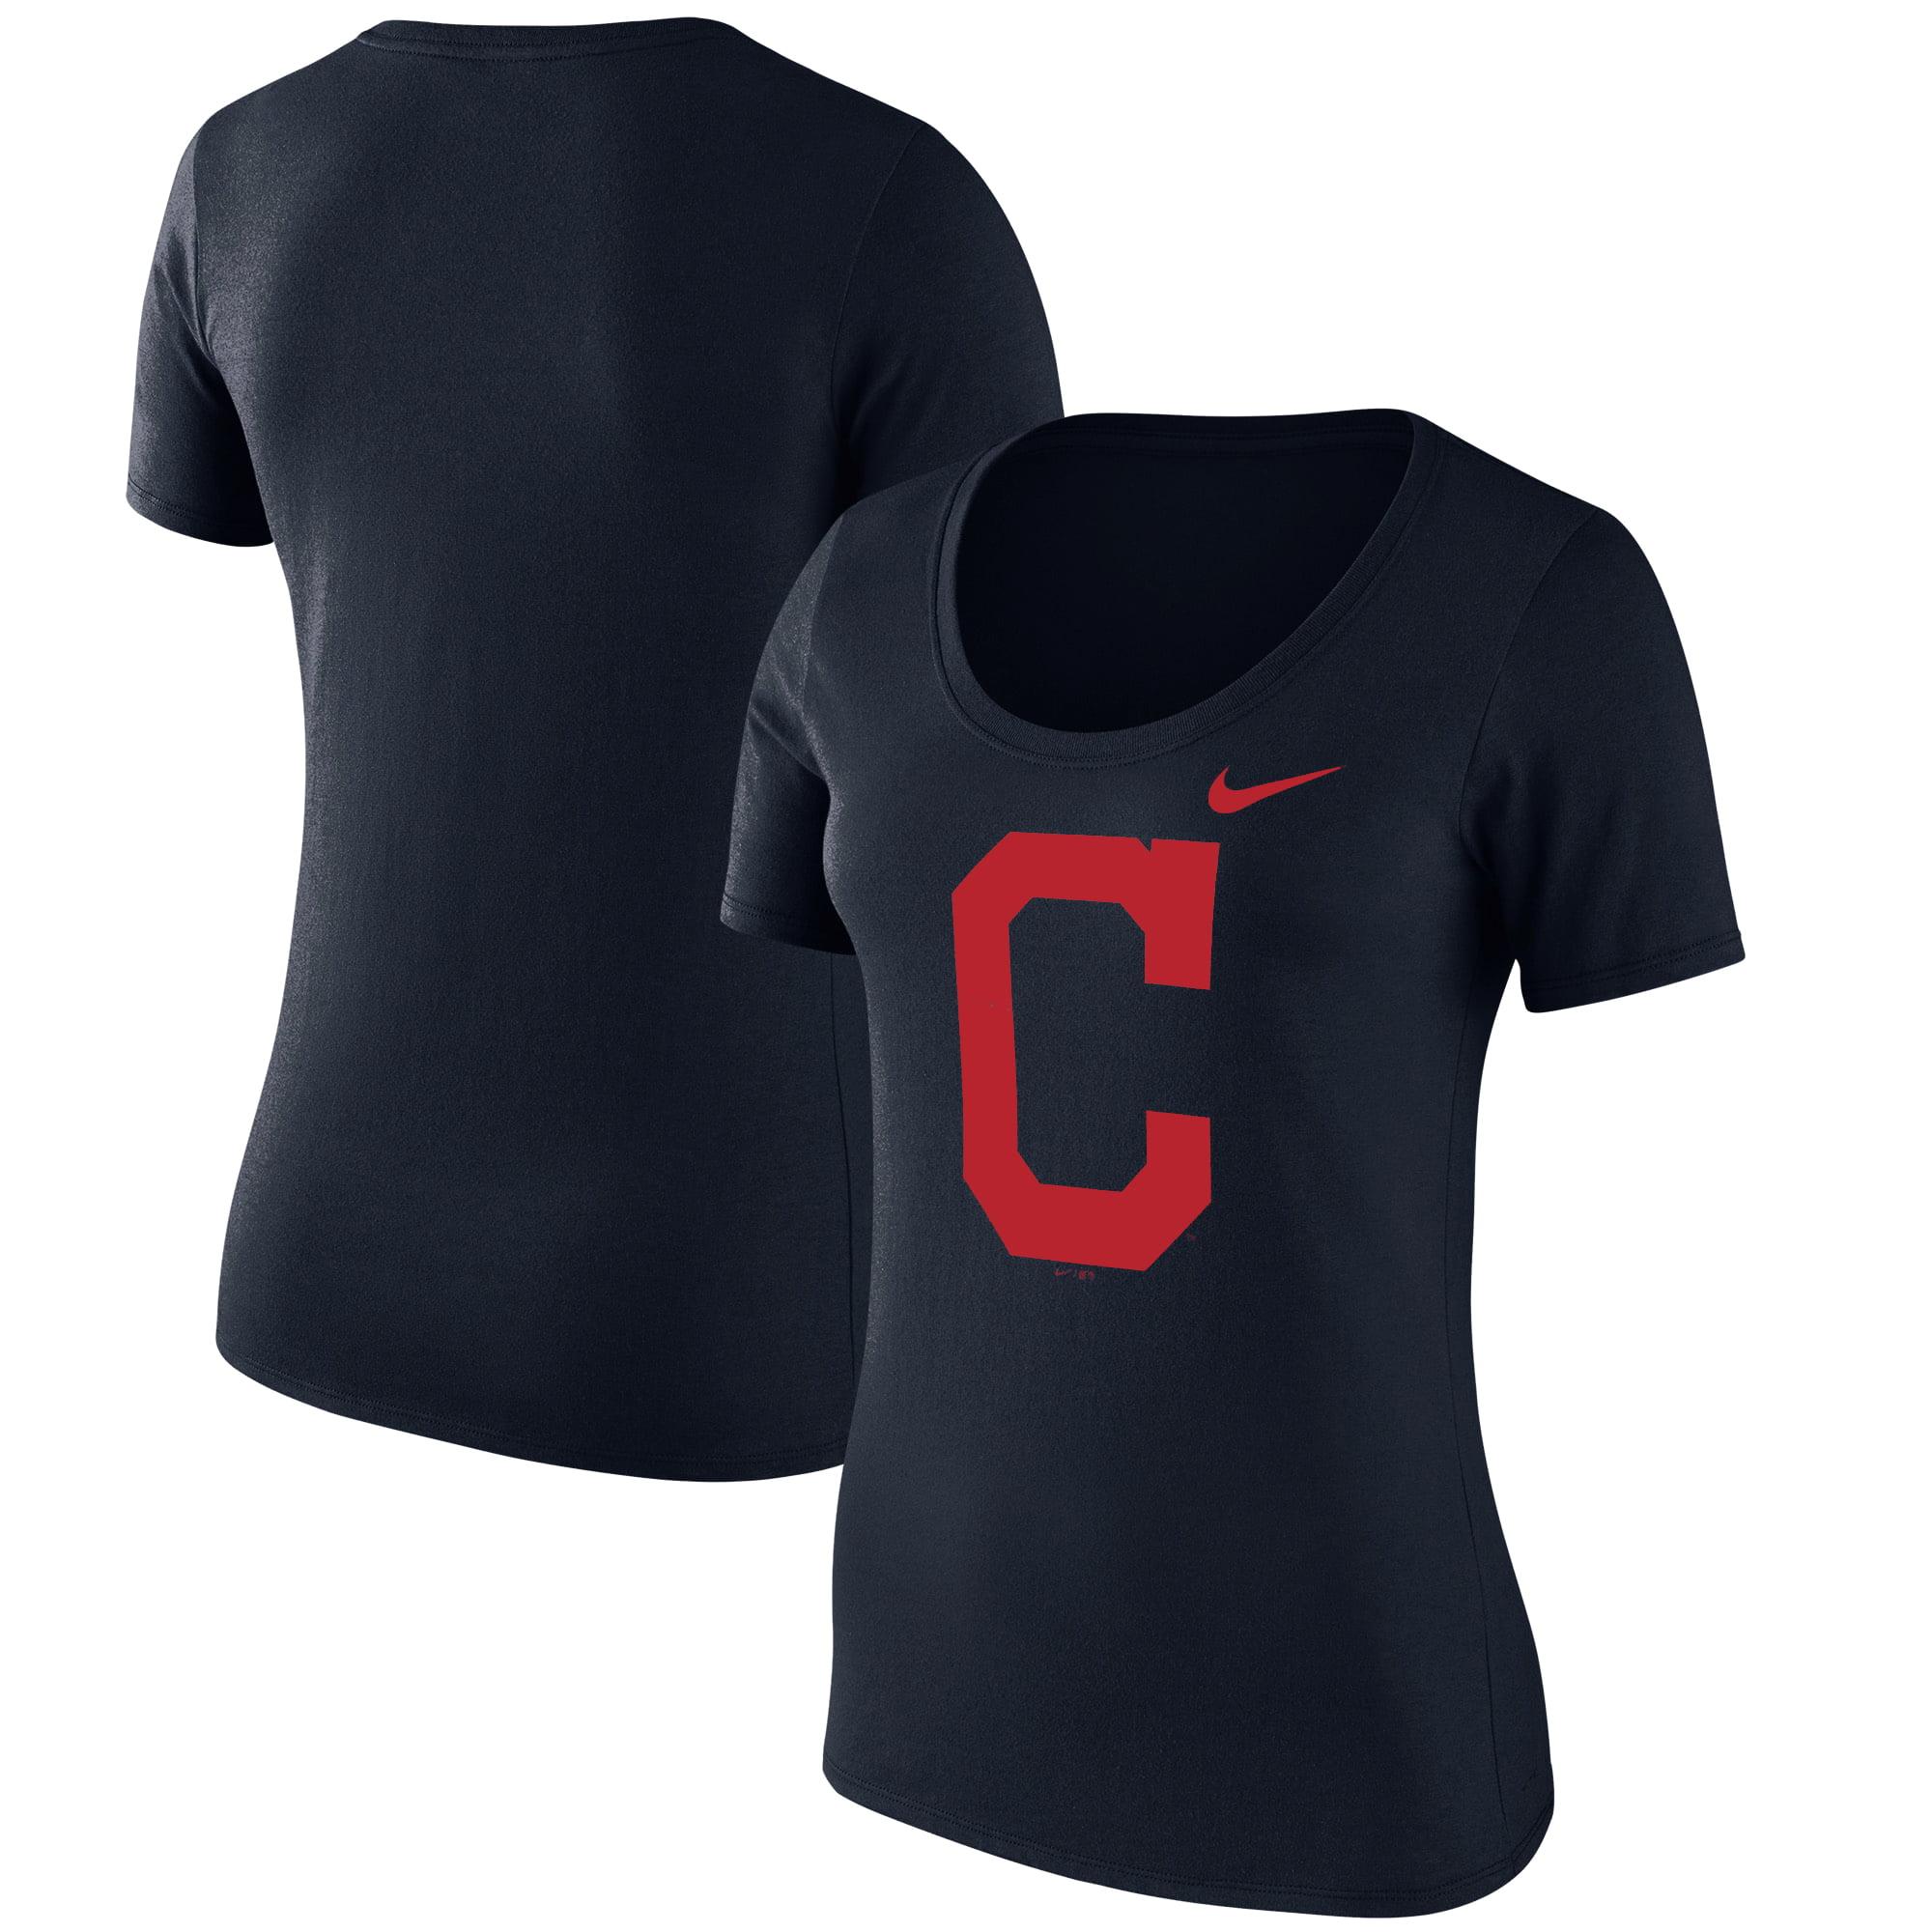 Cleveland Indians Nike Women's Logo Scoop Neck T-Shirt - Navy